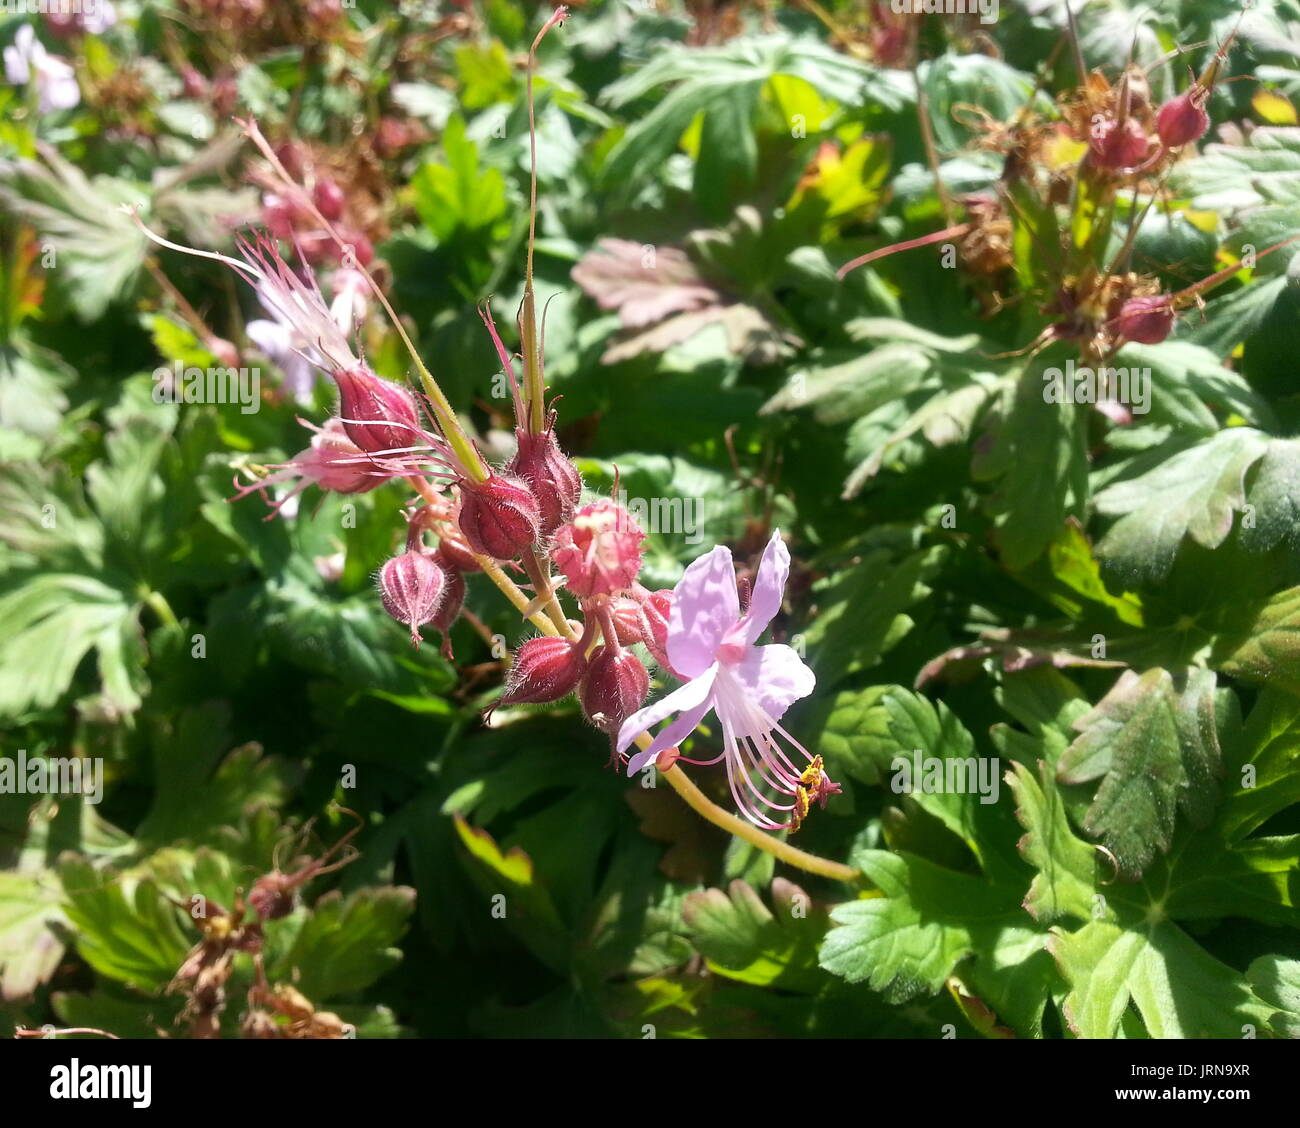 Pink Bush Flowers - Stock Image